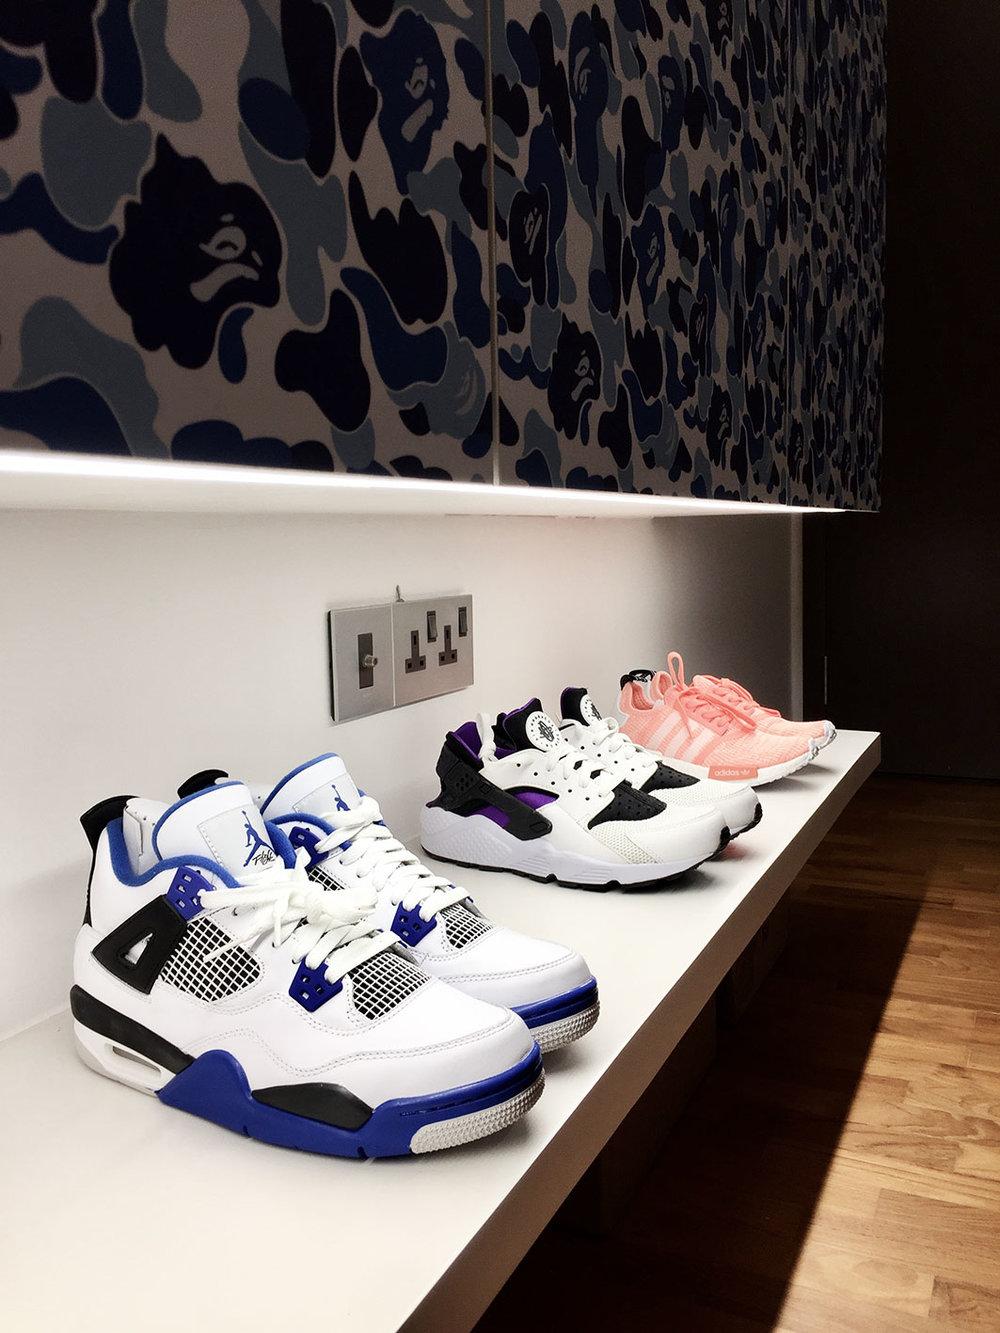 Shoe display.